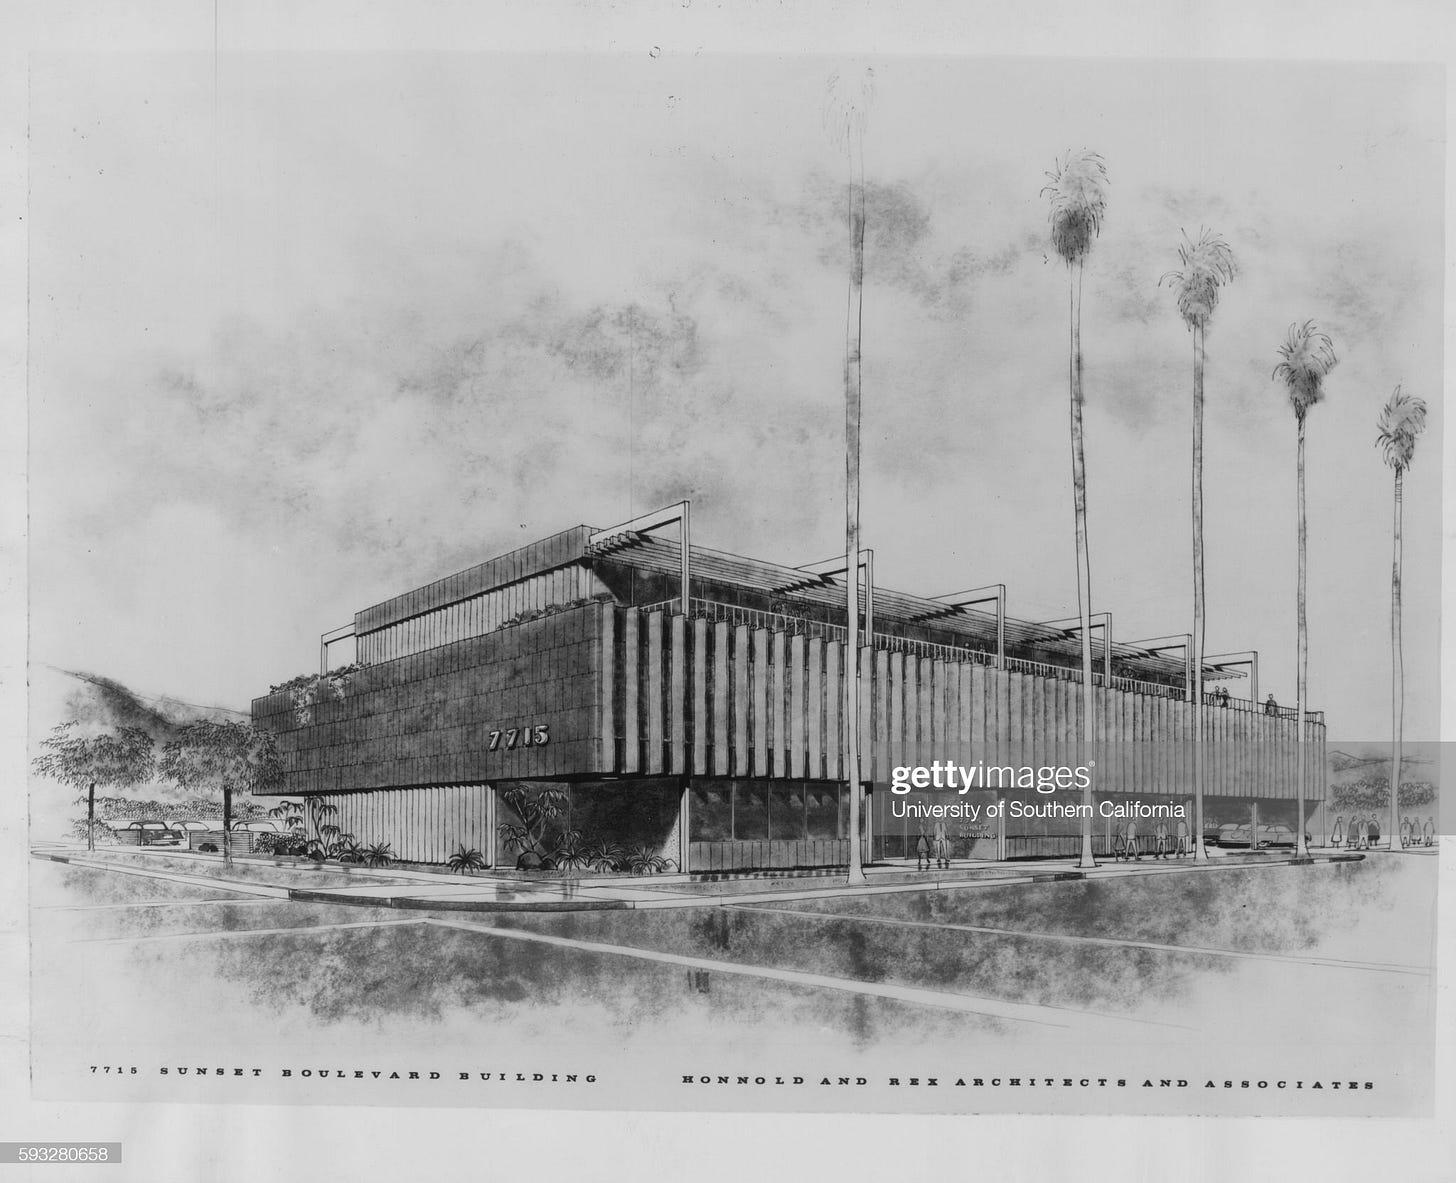 Motion picture cameramen & film editors unions building, 7715 Sunset Blvd., Los Angeles, 1959 : News Photo